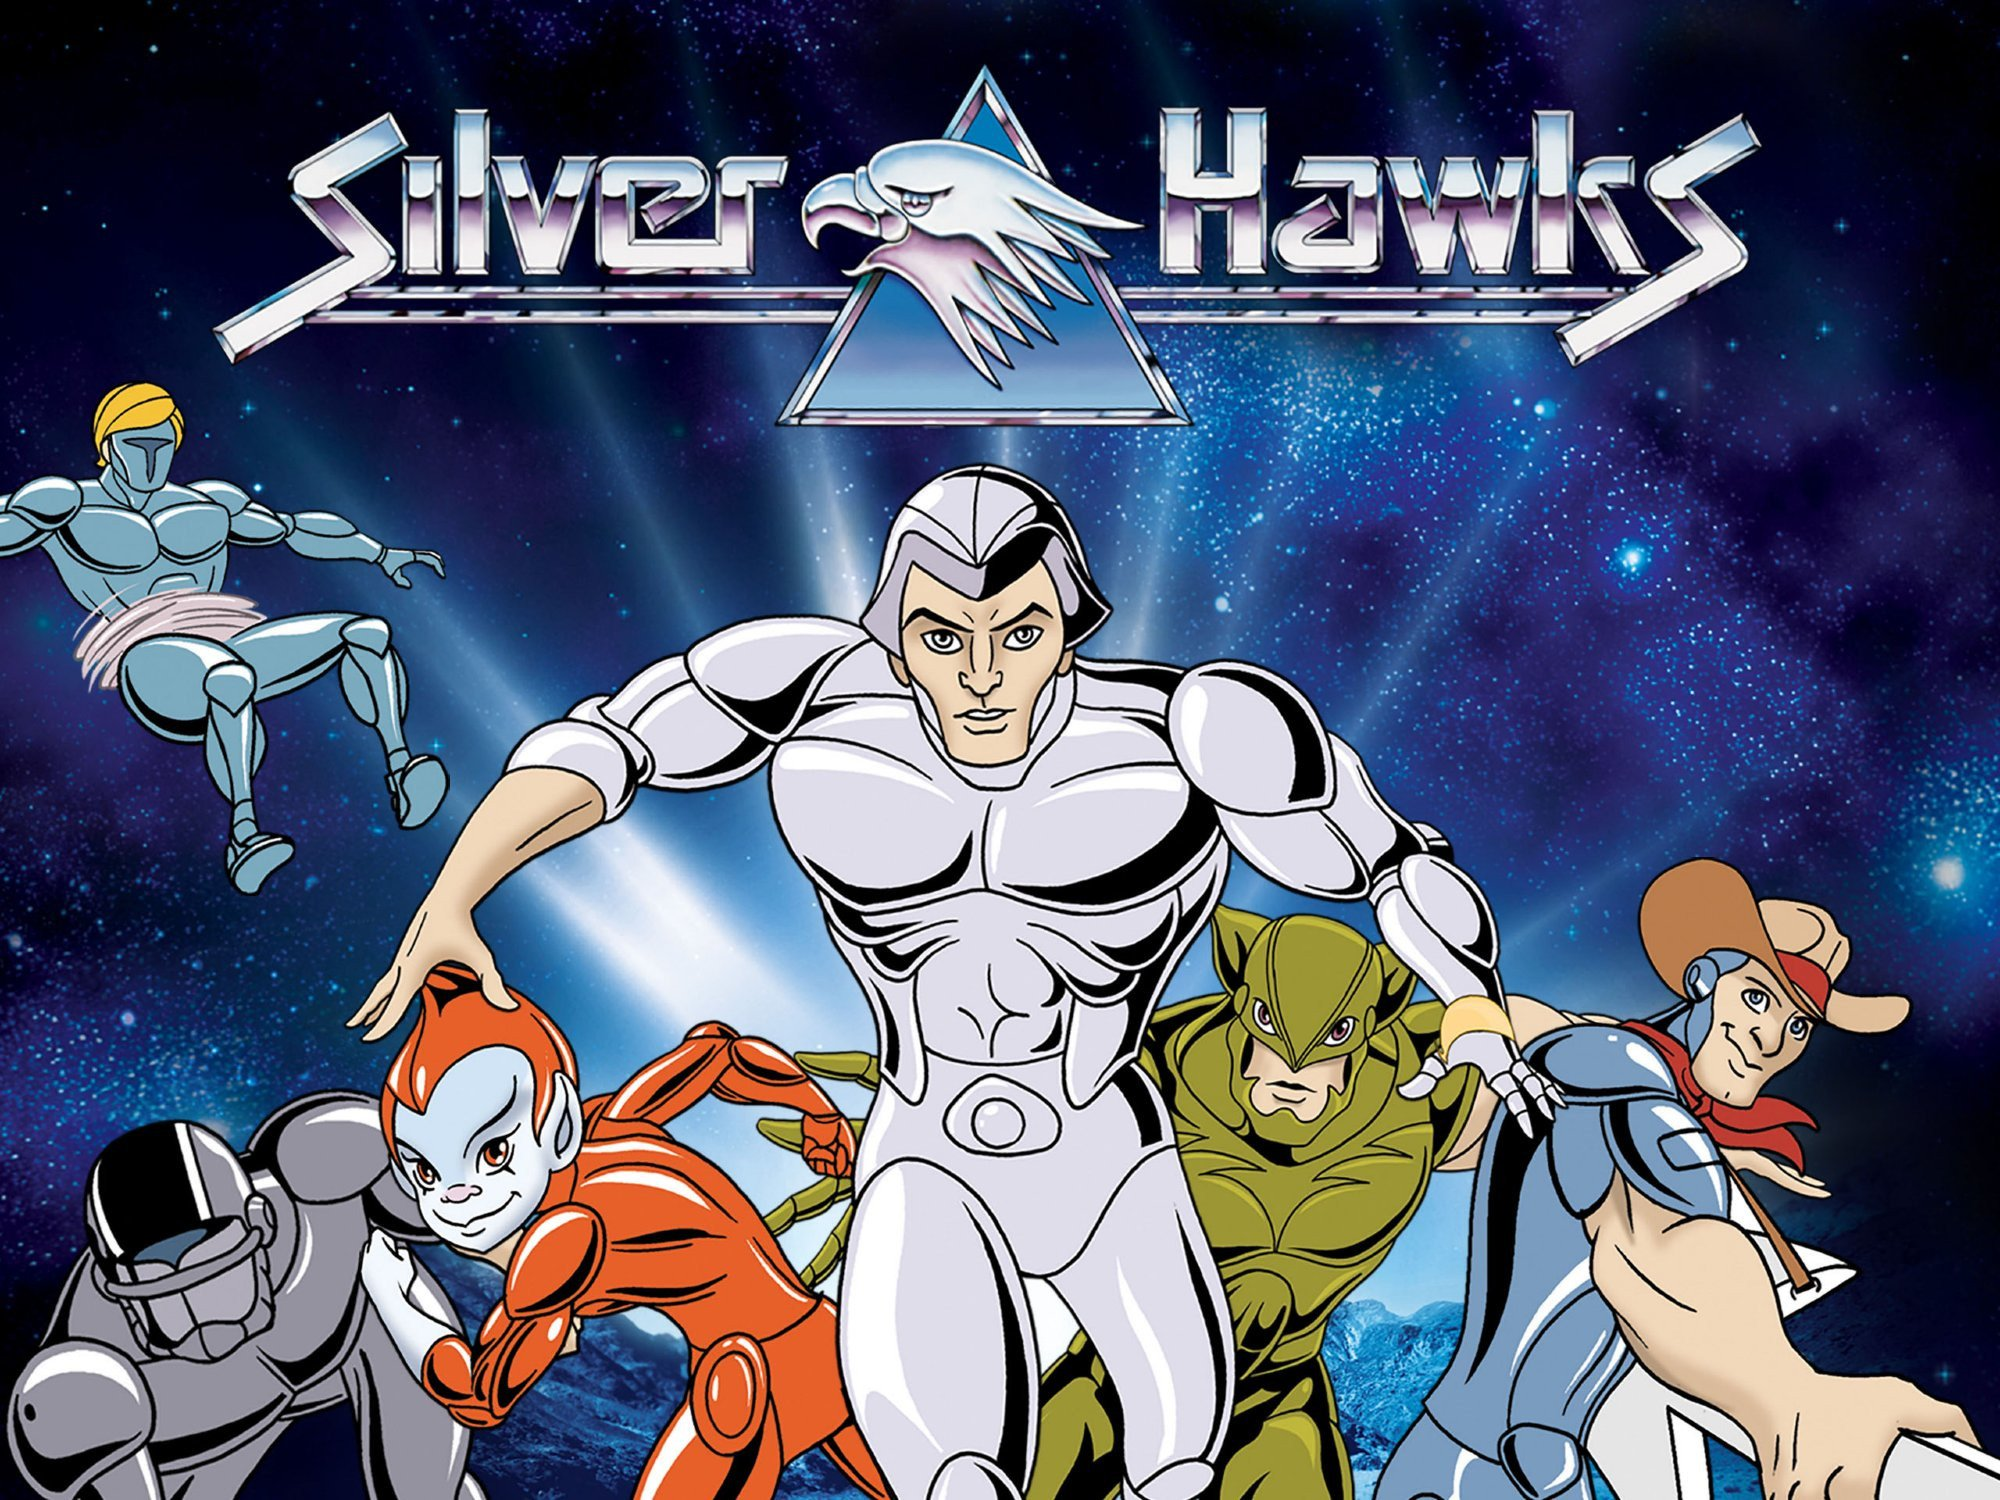 Amazon.com: Watch Silverhawks Season 1 Volume 1 | Prime Video